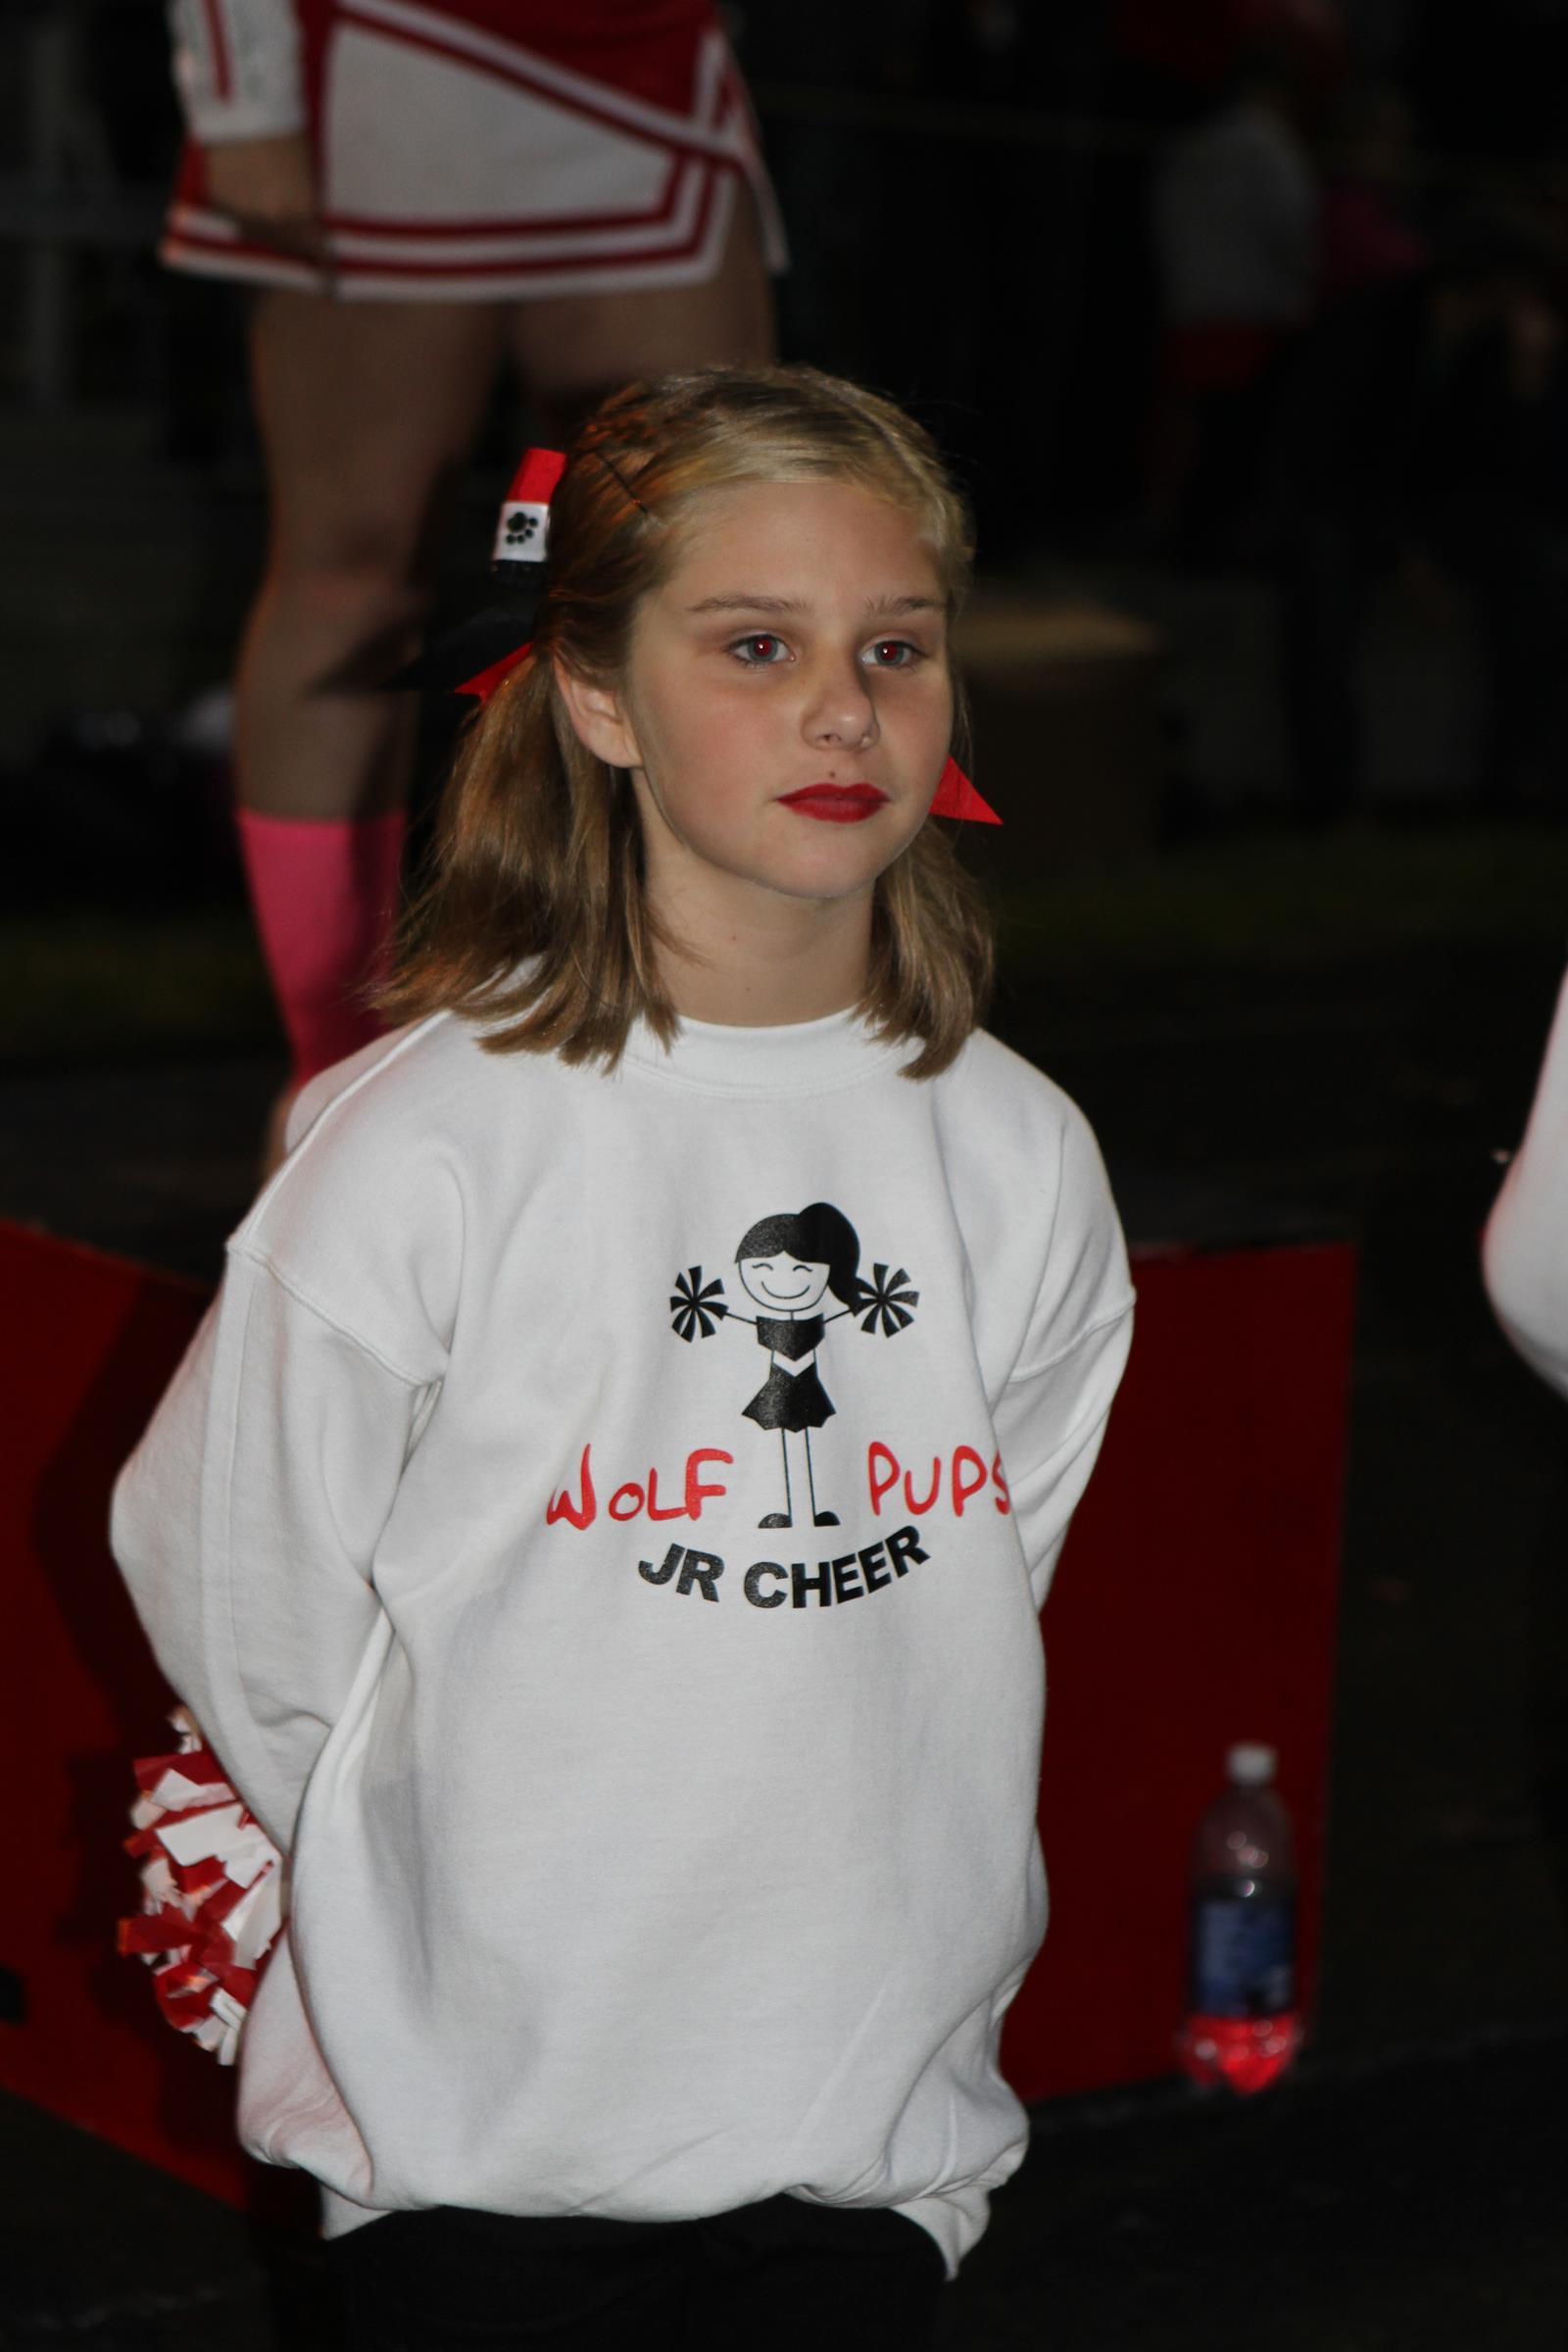 Friday Night Lights Cheerleader